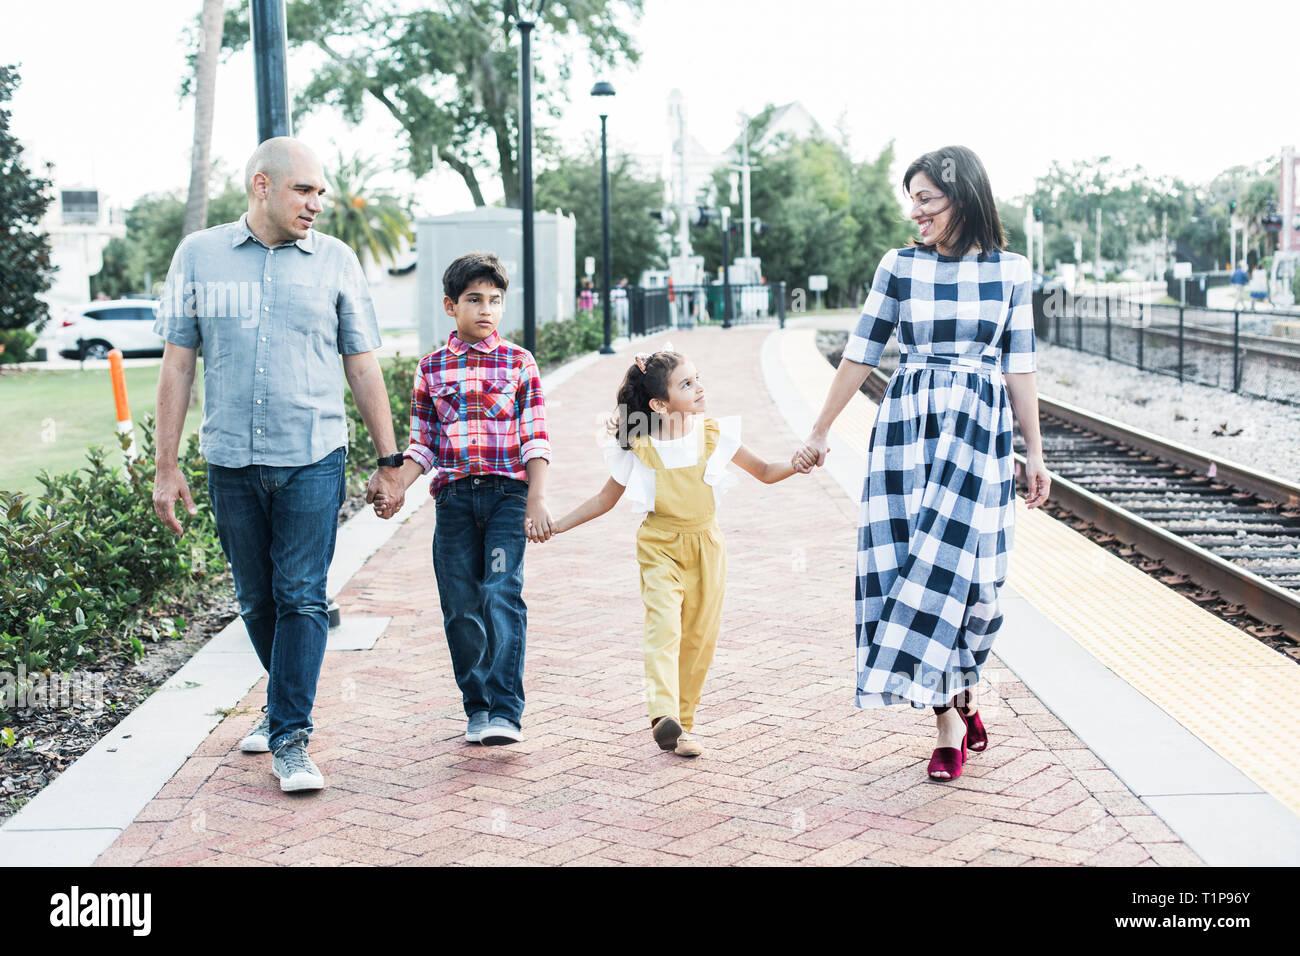 Family holding hand walking next train rail track - Stock Image